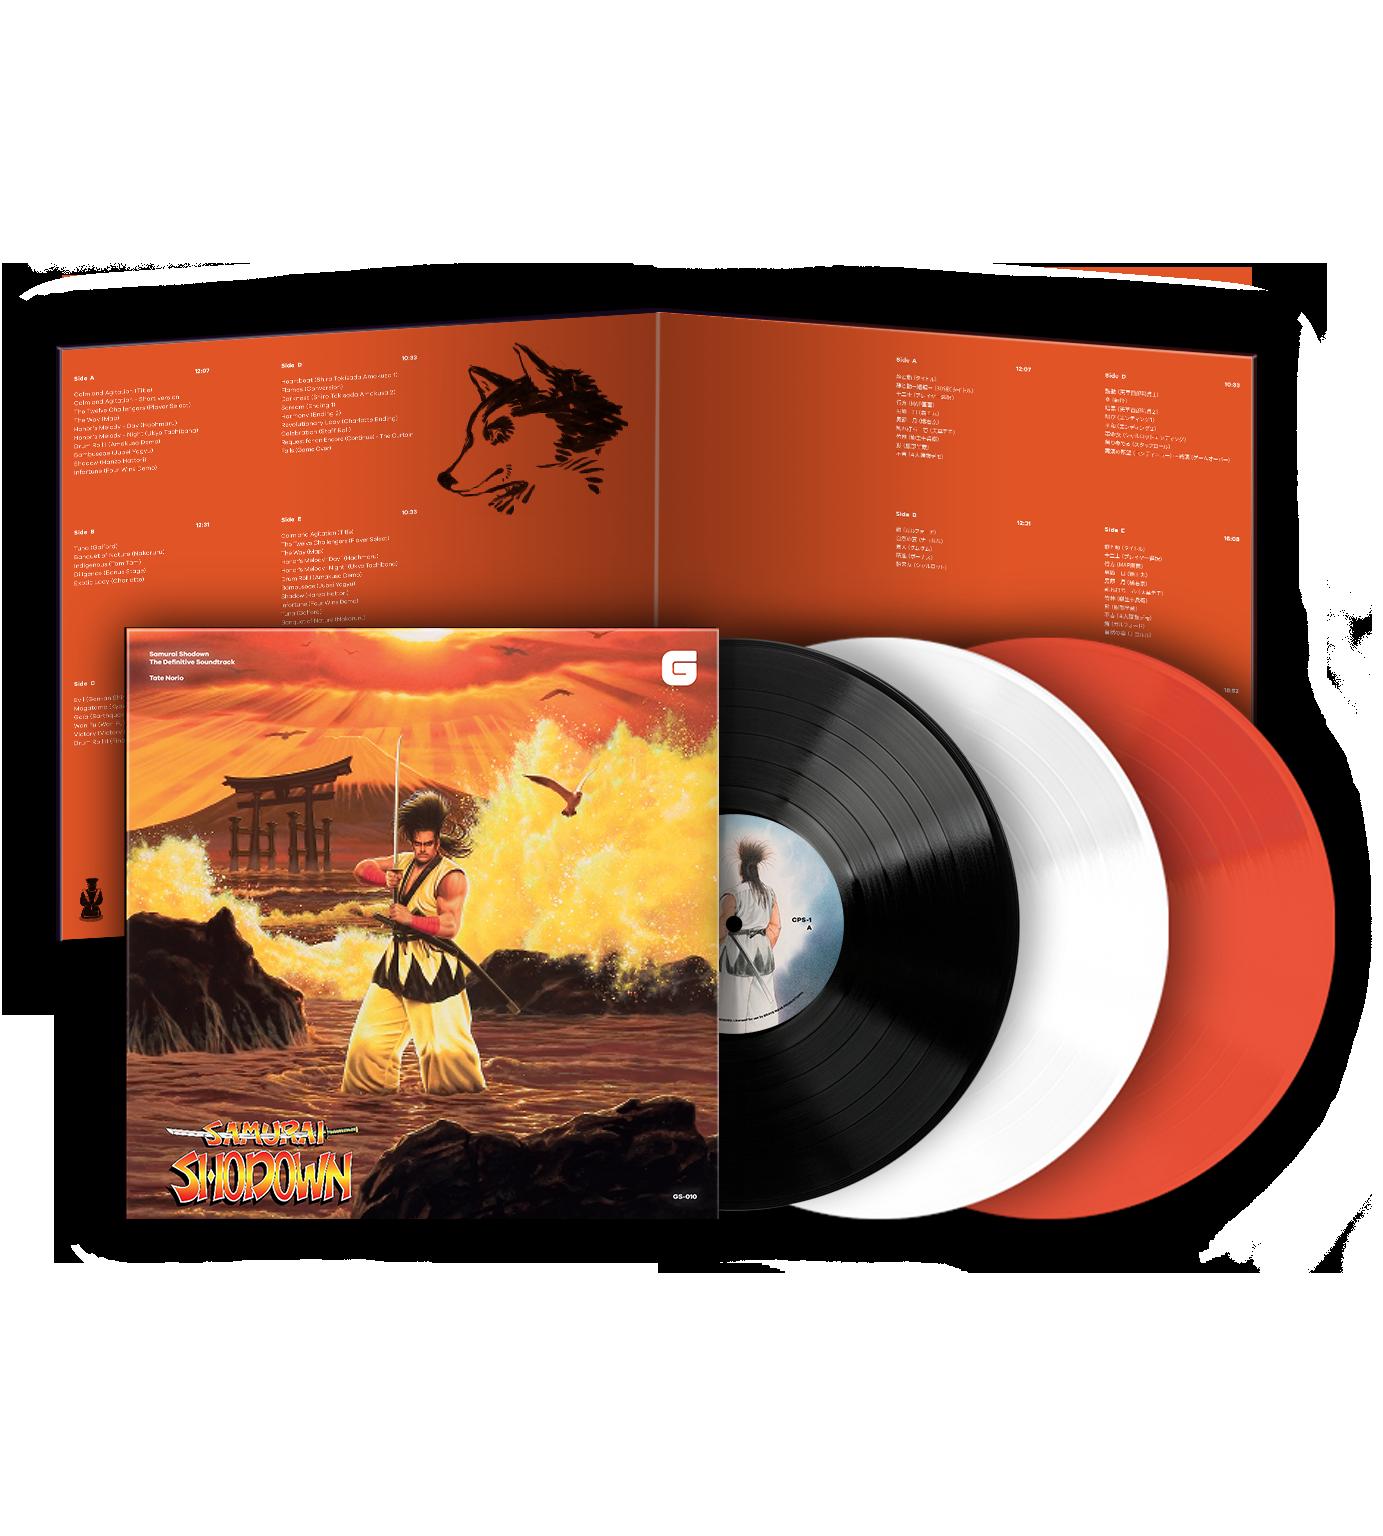 Samurai Shodown: The Definitive Soundtrack